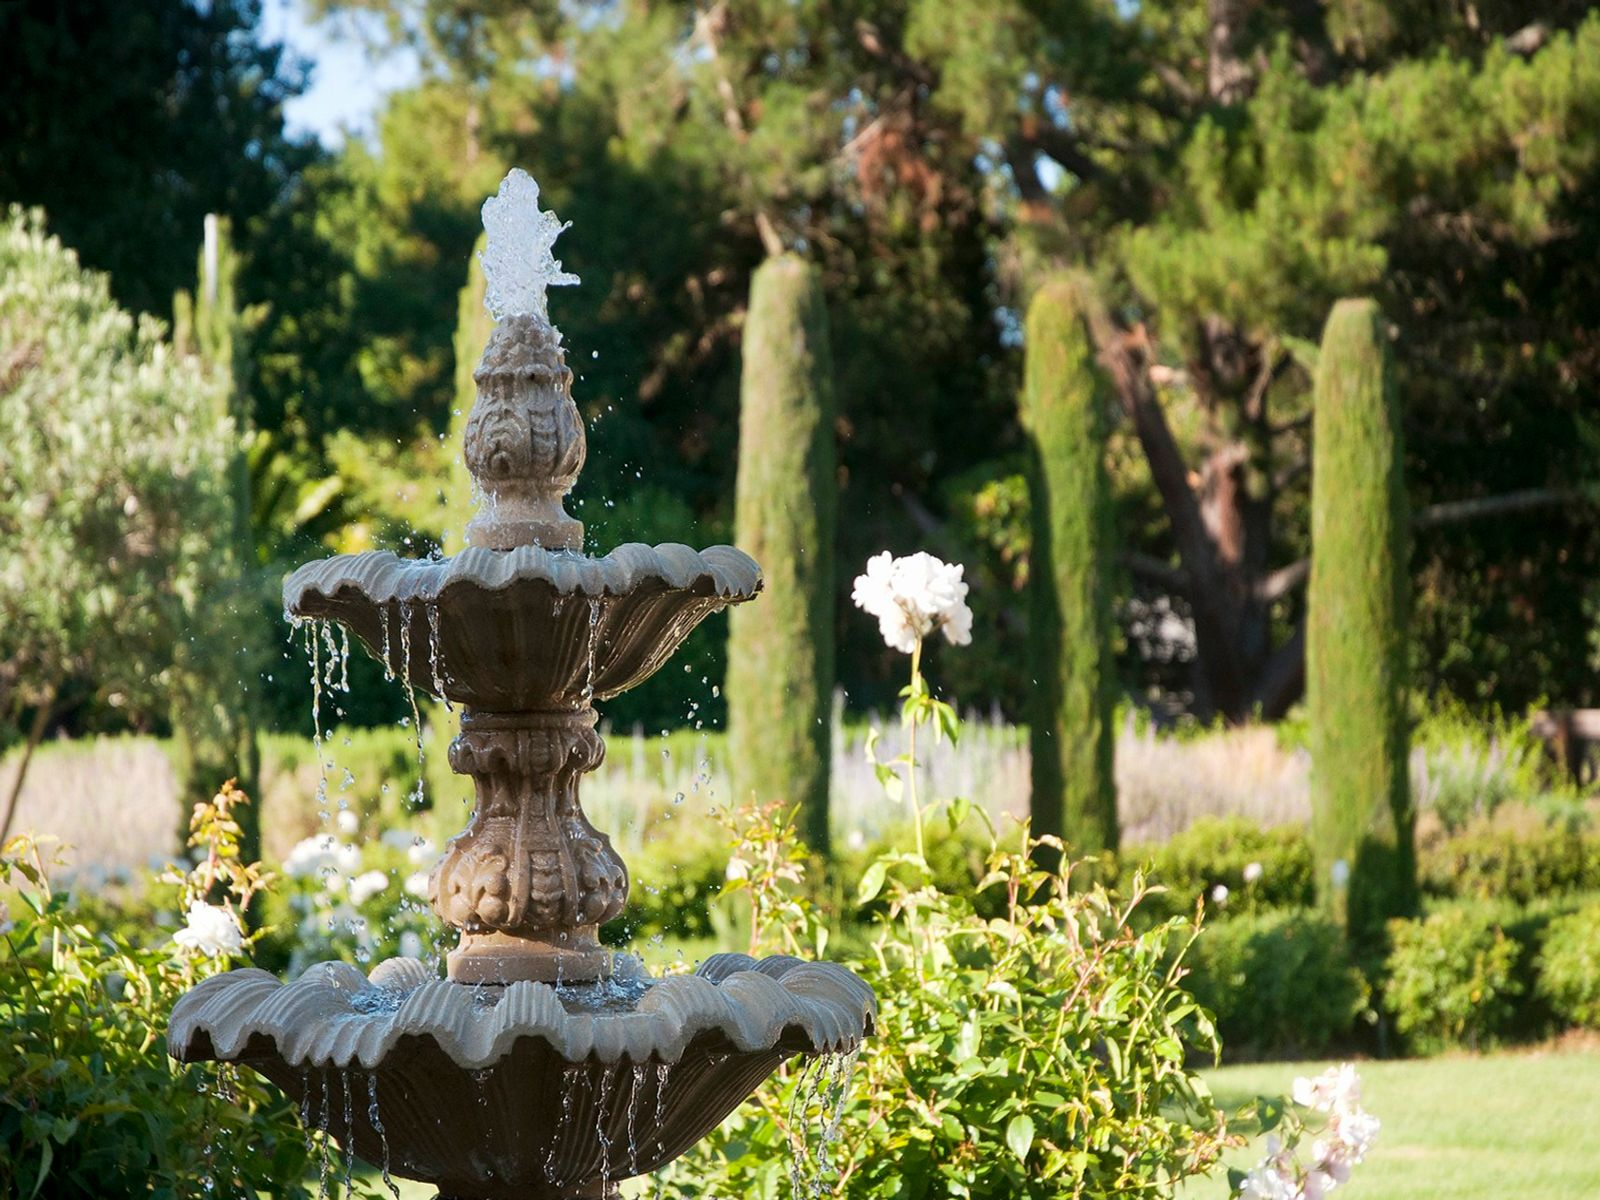 Limestone lion fountains plus 3 more fountains